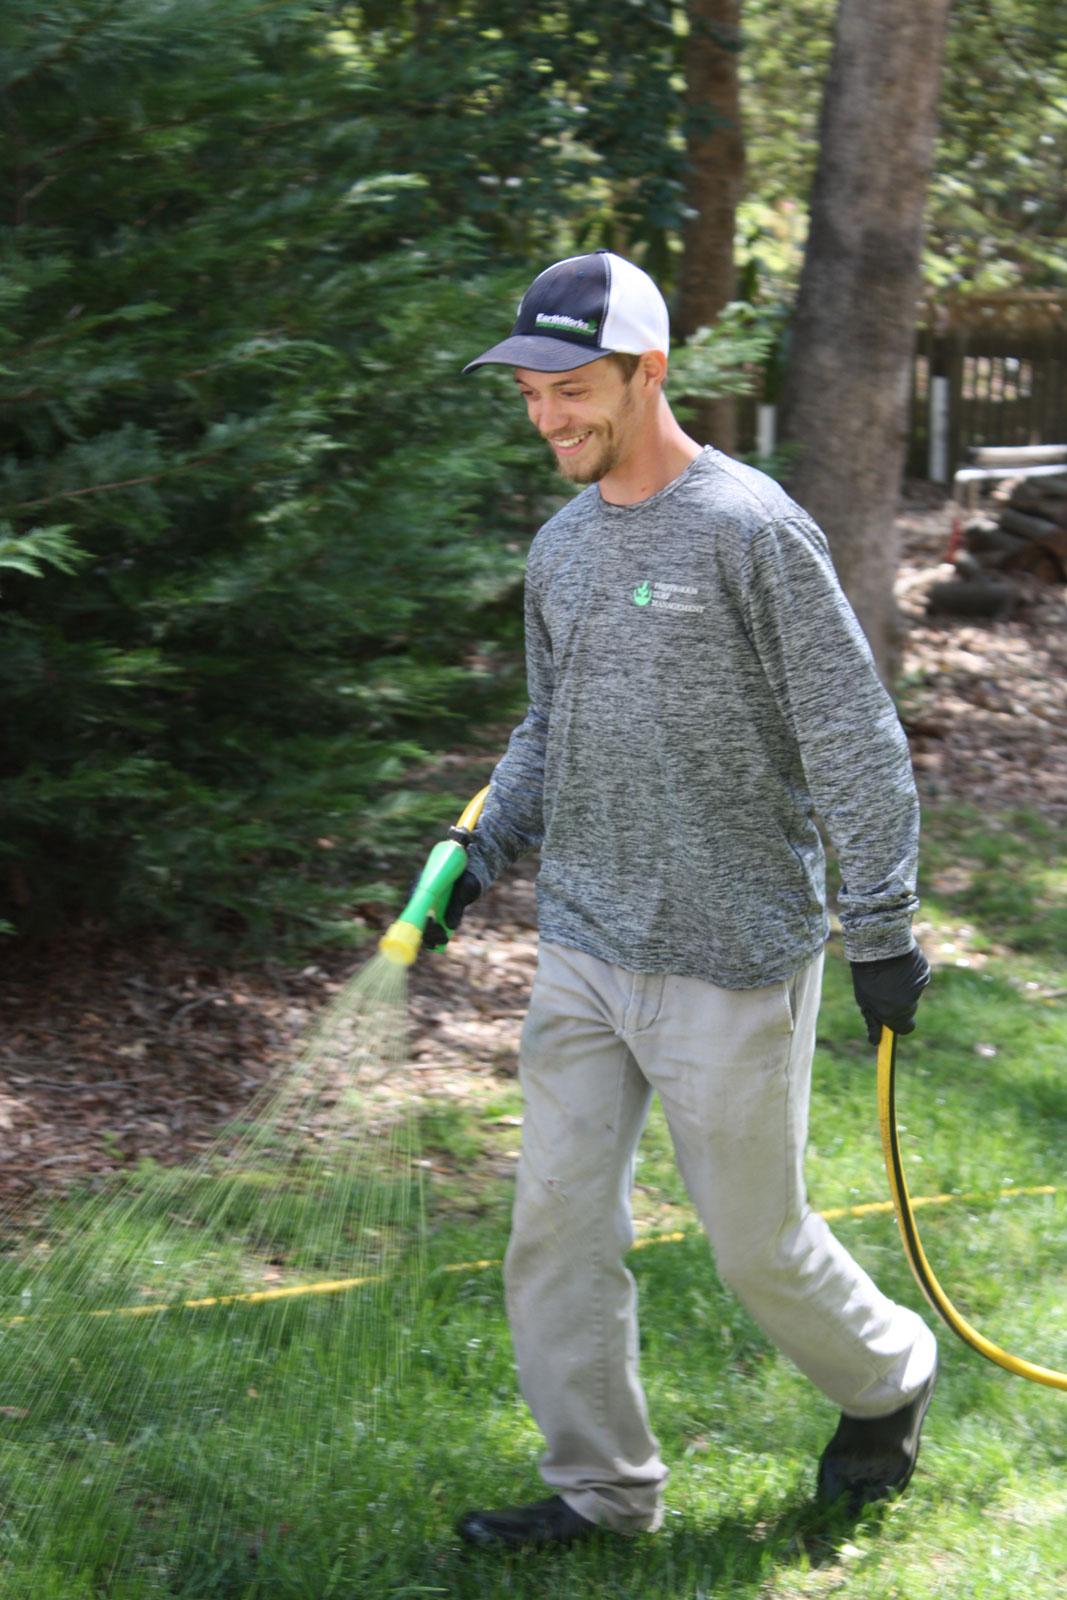 Prestigious Turf Management - Weed Control spraying - Yorktown, Newport News, Williamsburg